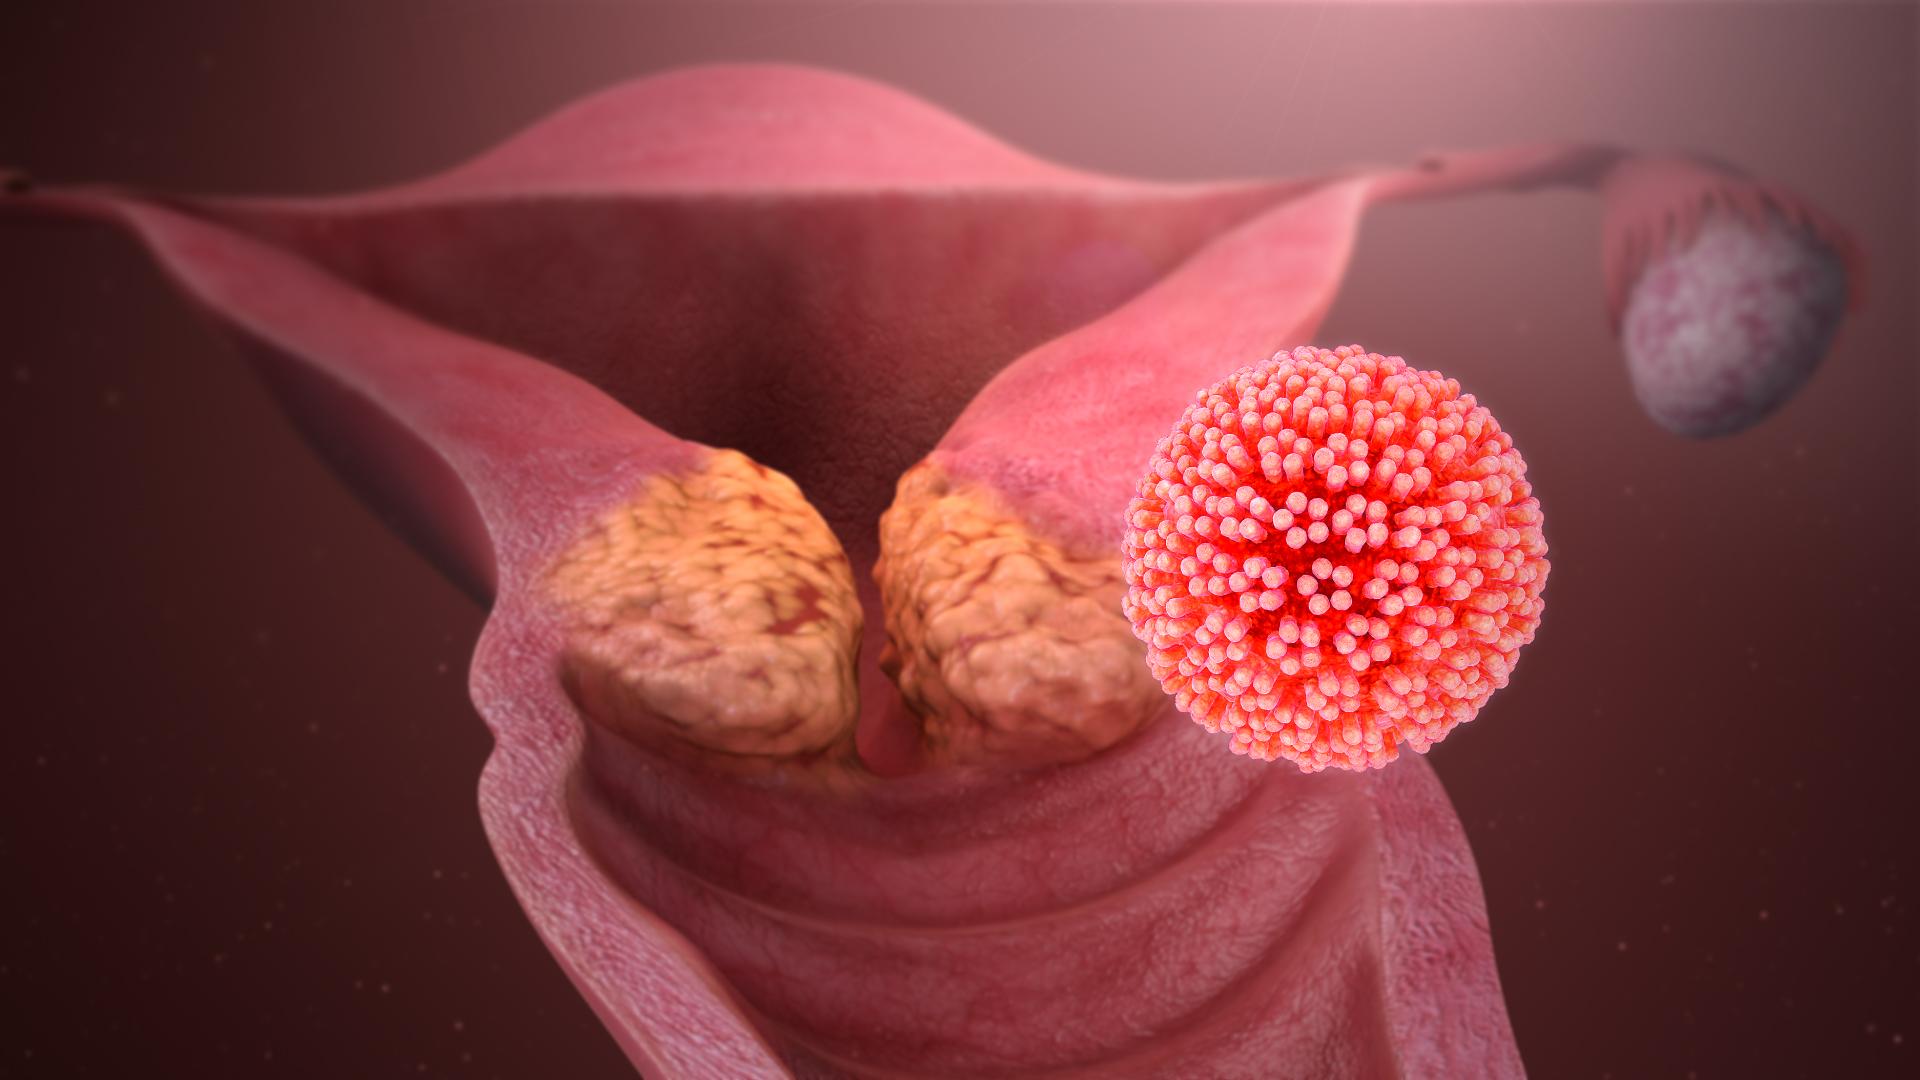 papilloma virus ad un uomo vaccino papilloma virus uomo 40 anni